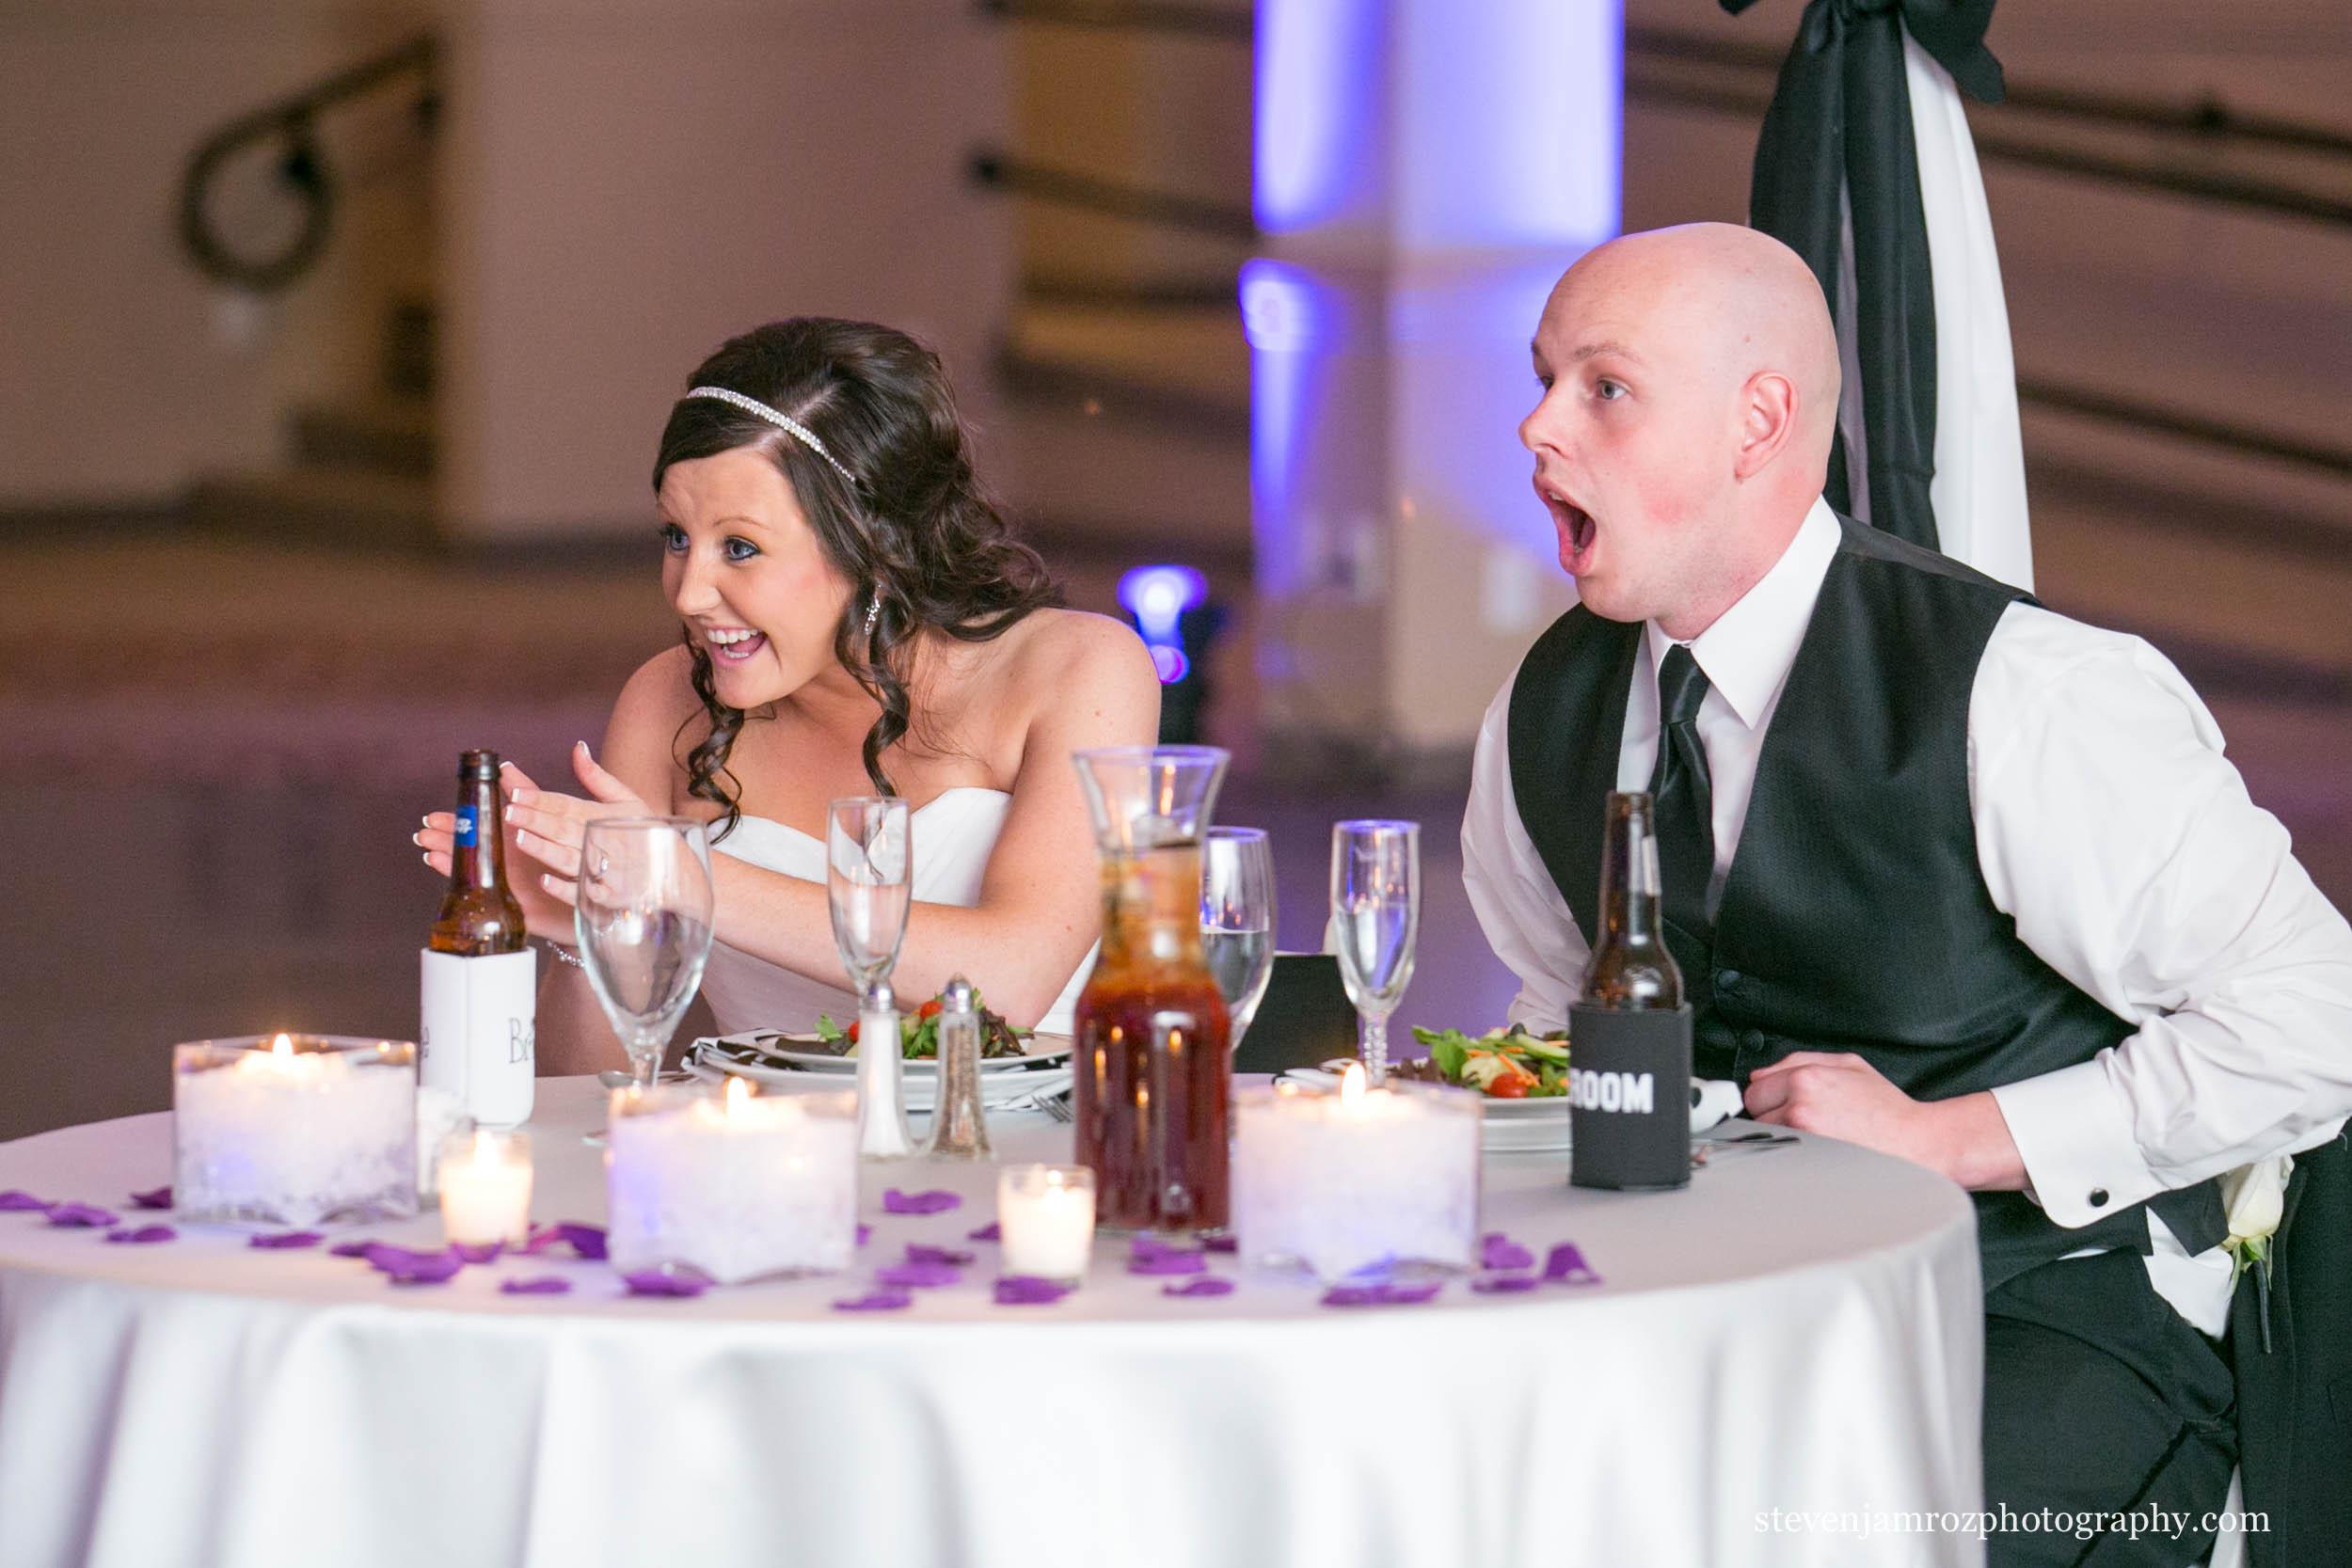 moment-photojouranlism-wedding-raleigh-steven-jamroz-photography-0494.jpg